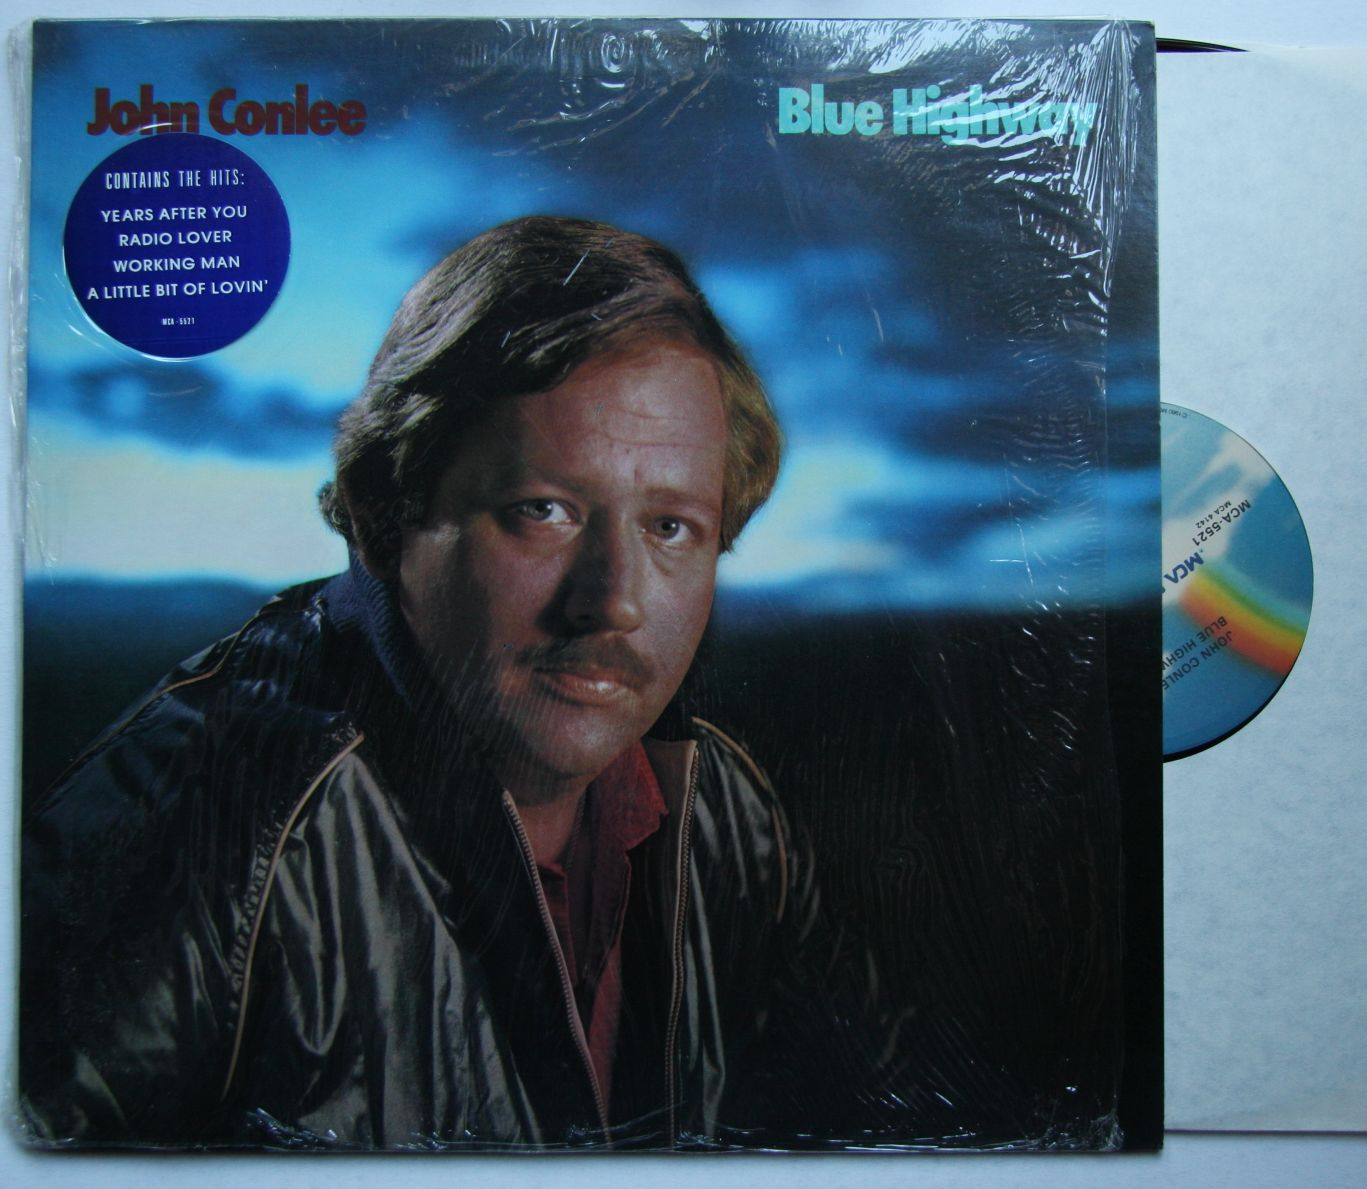 John Conlee - Blue Highway